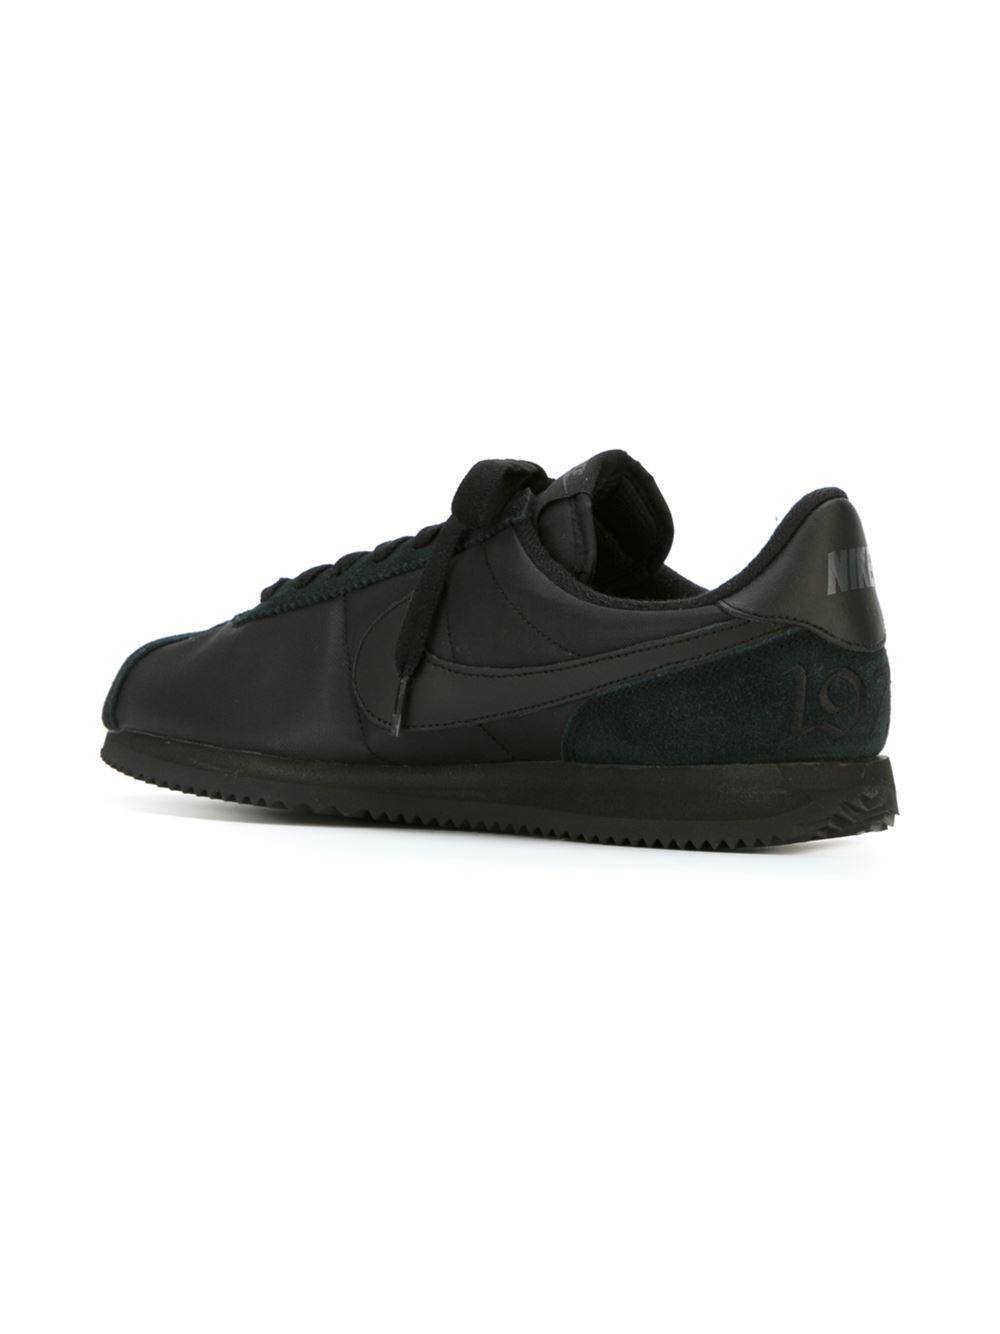 Nike Cortez Basic 1972 Qs Sneakers In Black For Men Lyst